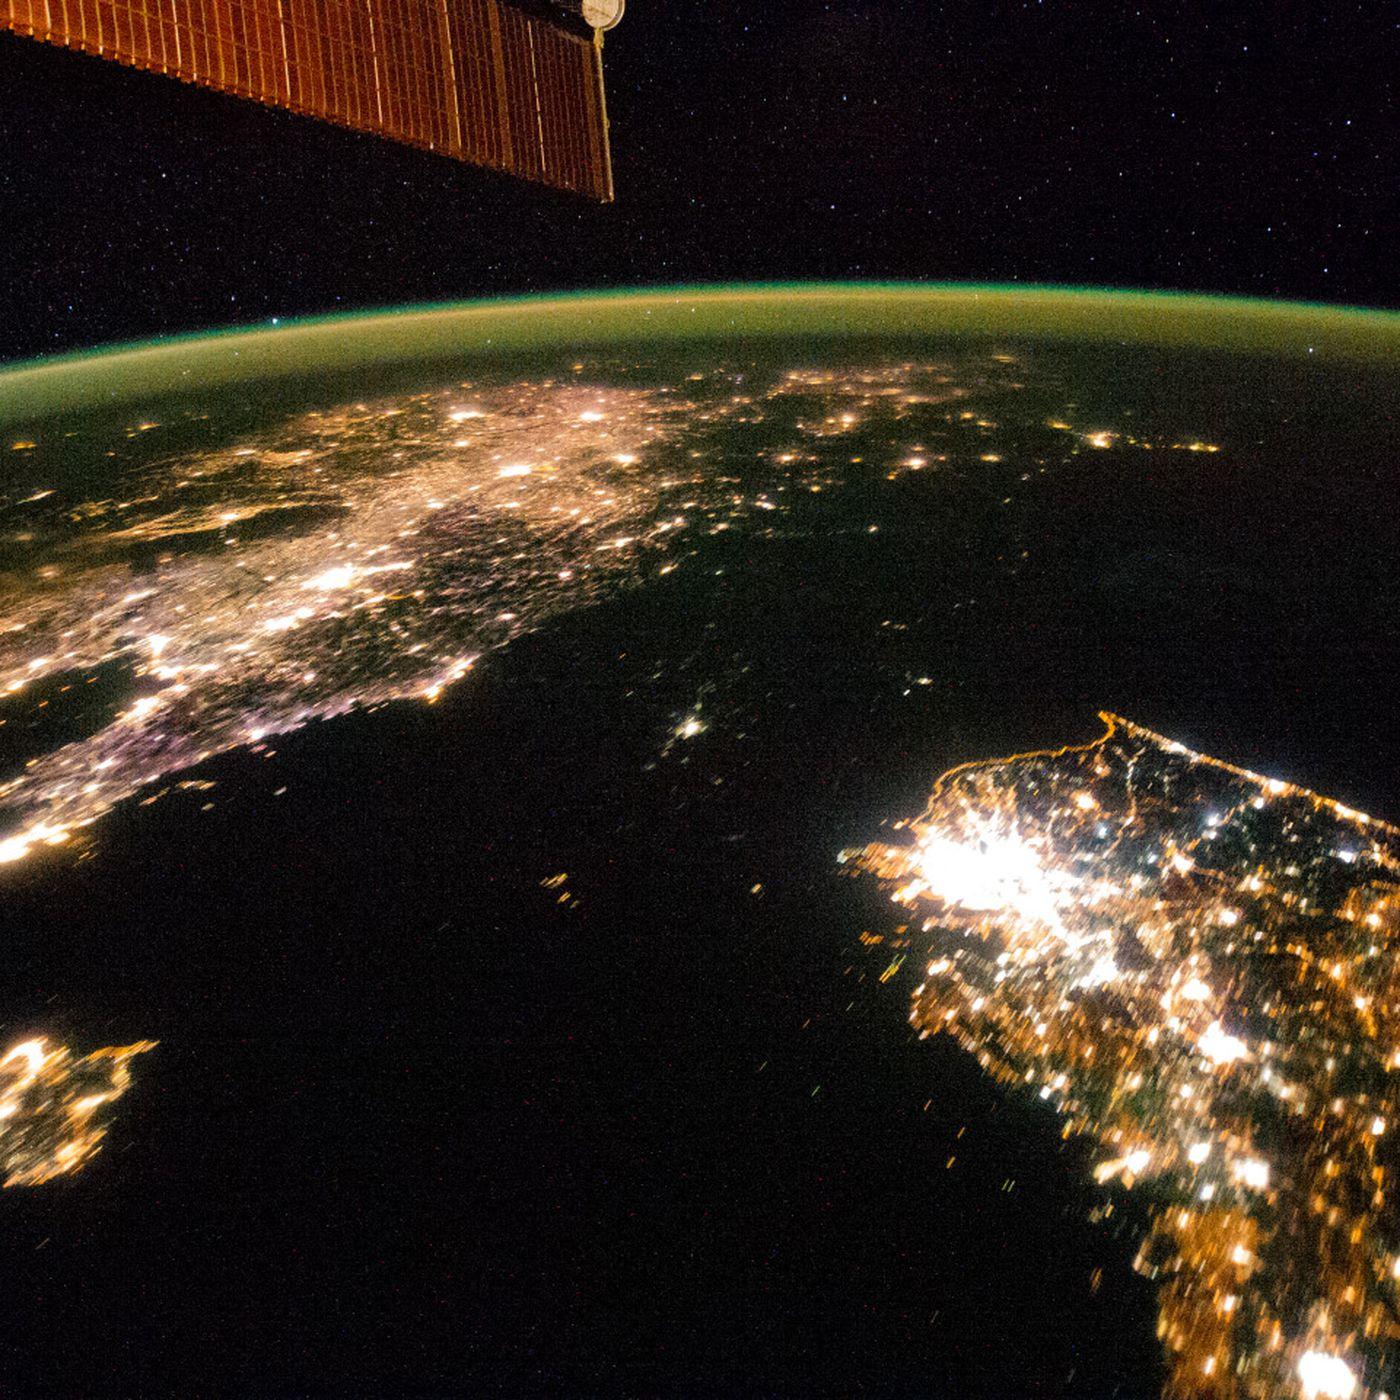 North Korea defends blackout satellite photos: 'the essence ... on map of saudi arabia satellite, map of sri lanka satellite, map of greenland satellite, map of israel satellite, map of korean peninsula satellite, map of singapore satellite, map of pakistan satellite, map of philippines satellite,